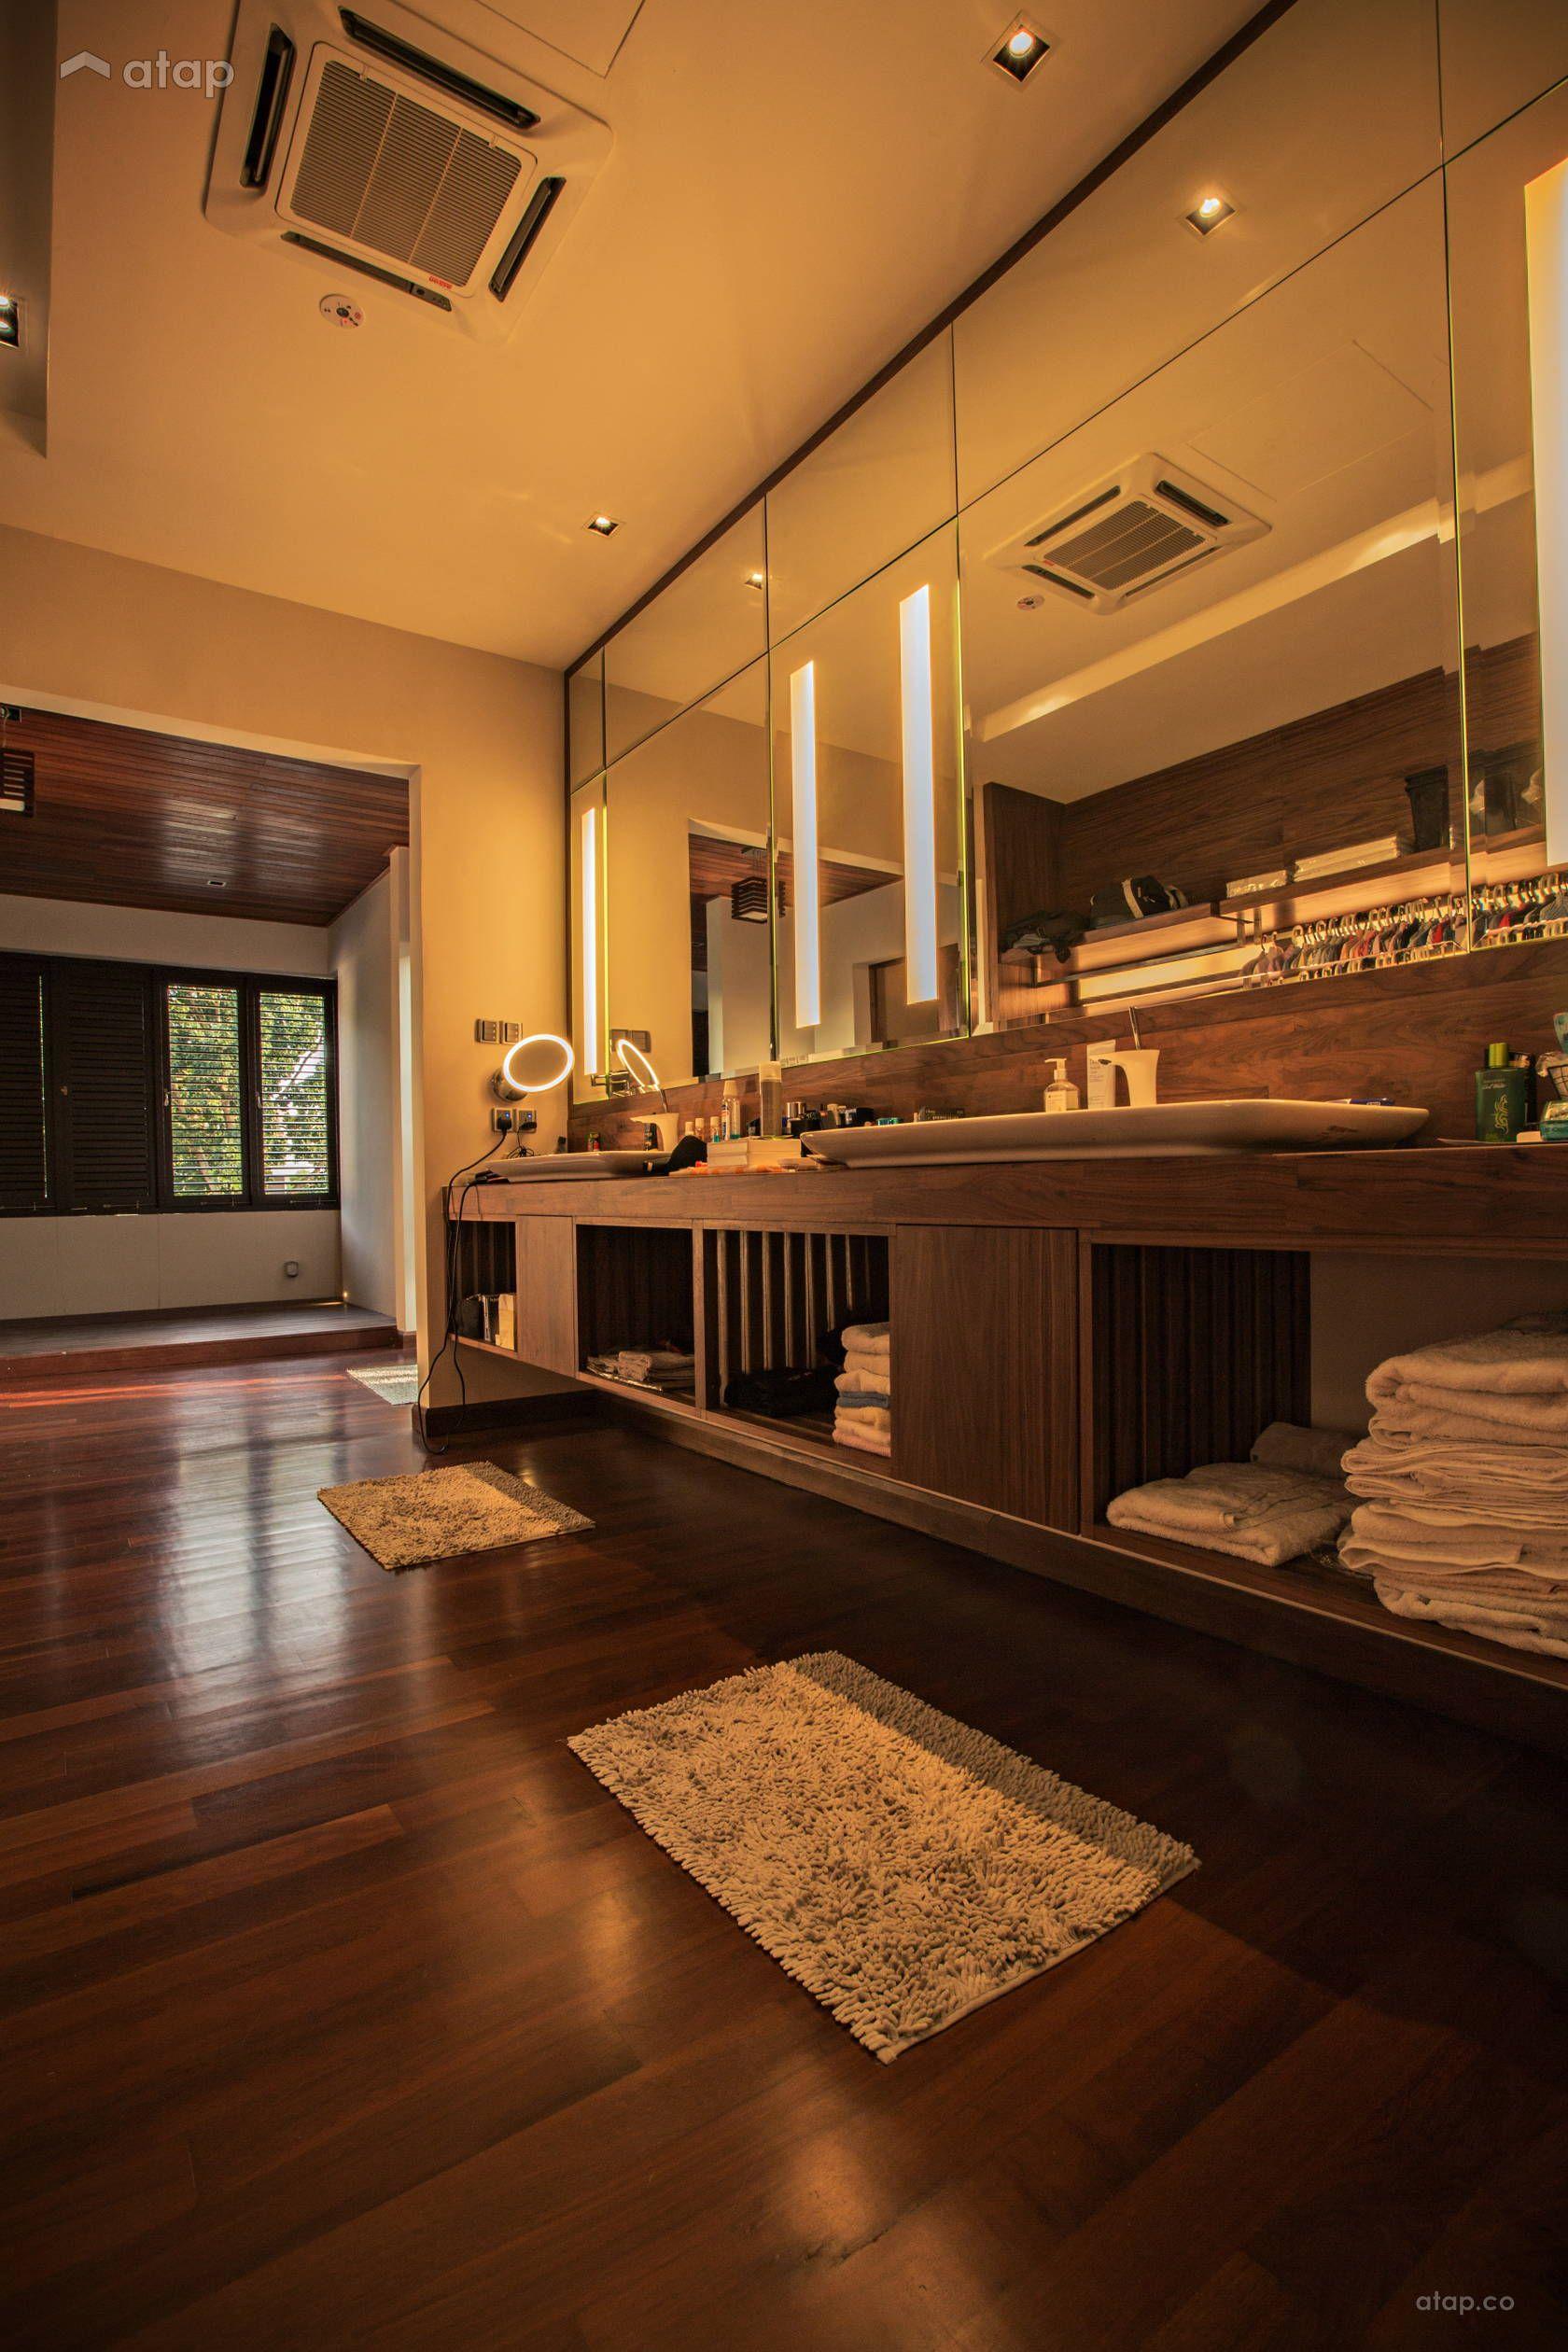 Home Design Ideas Malaysia: Asian Bathroom Bungalow Design Ideas & Photos Malaysia